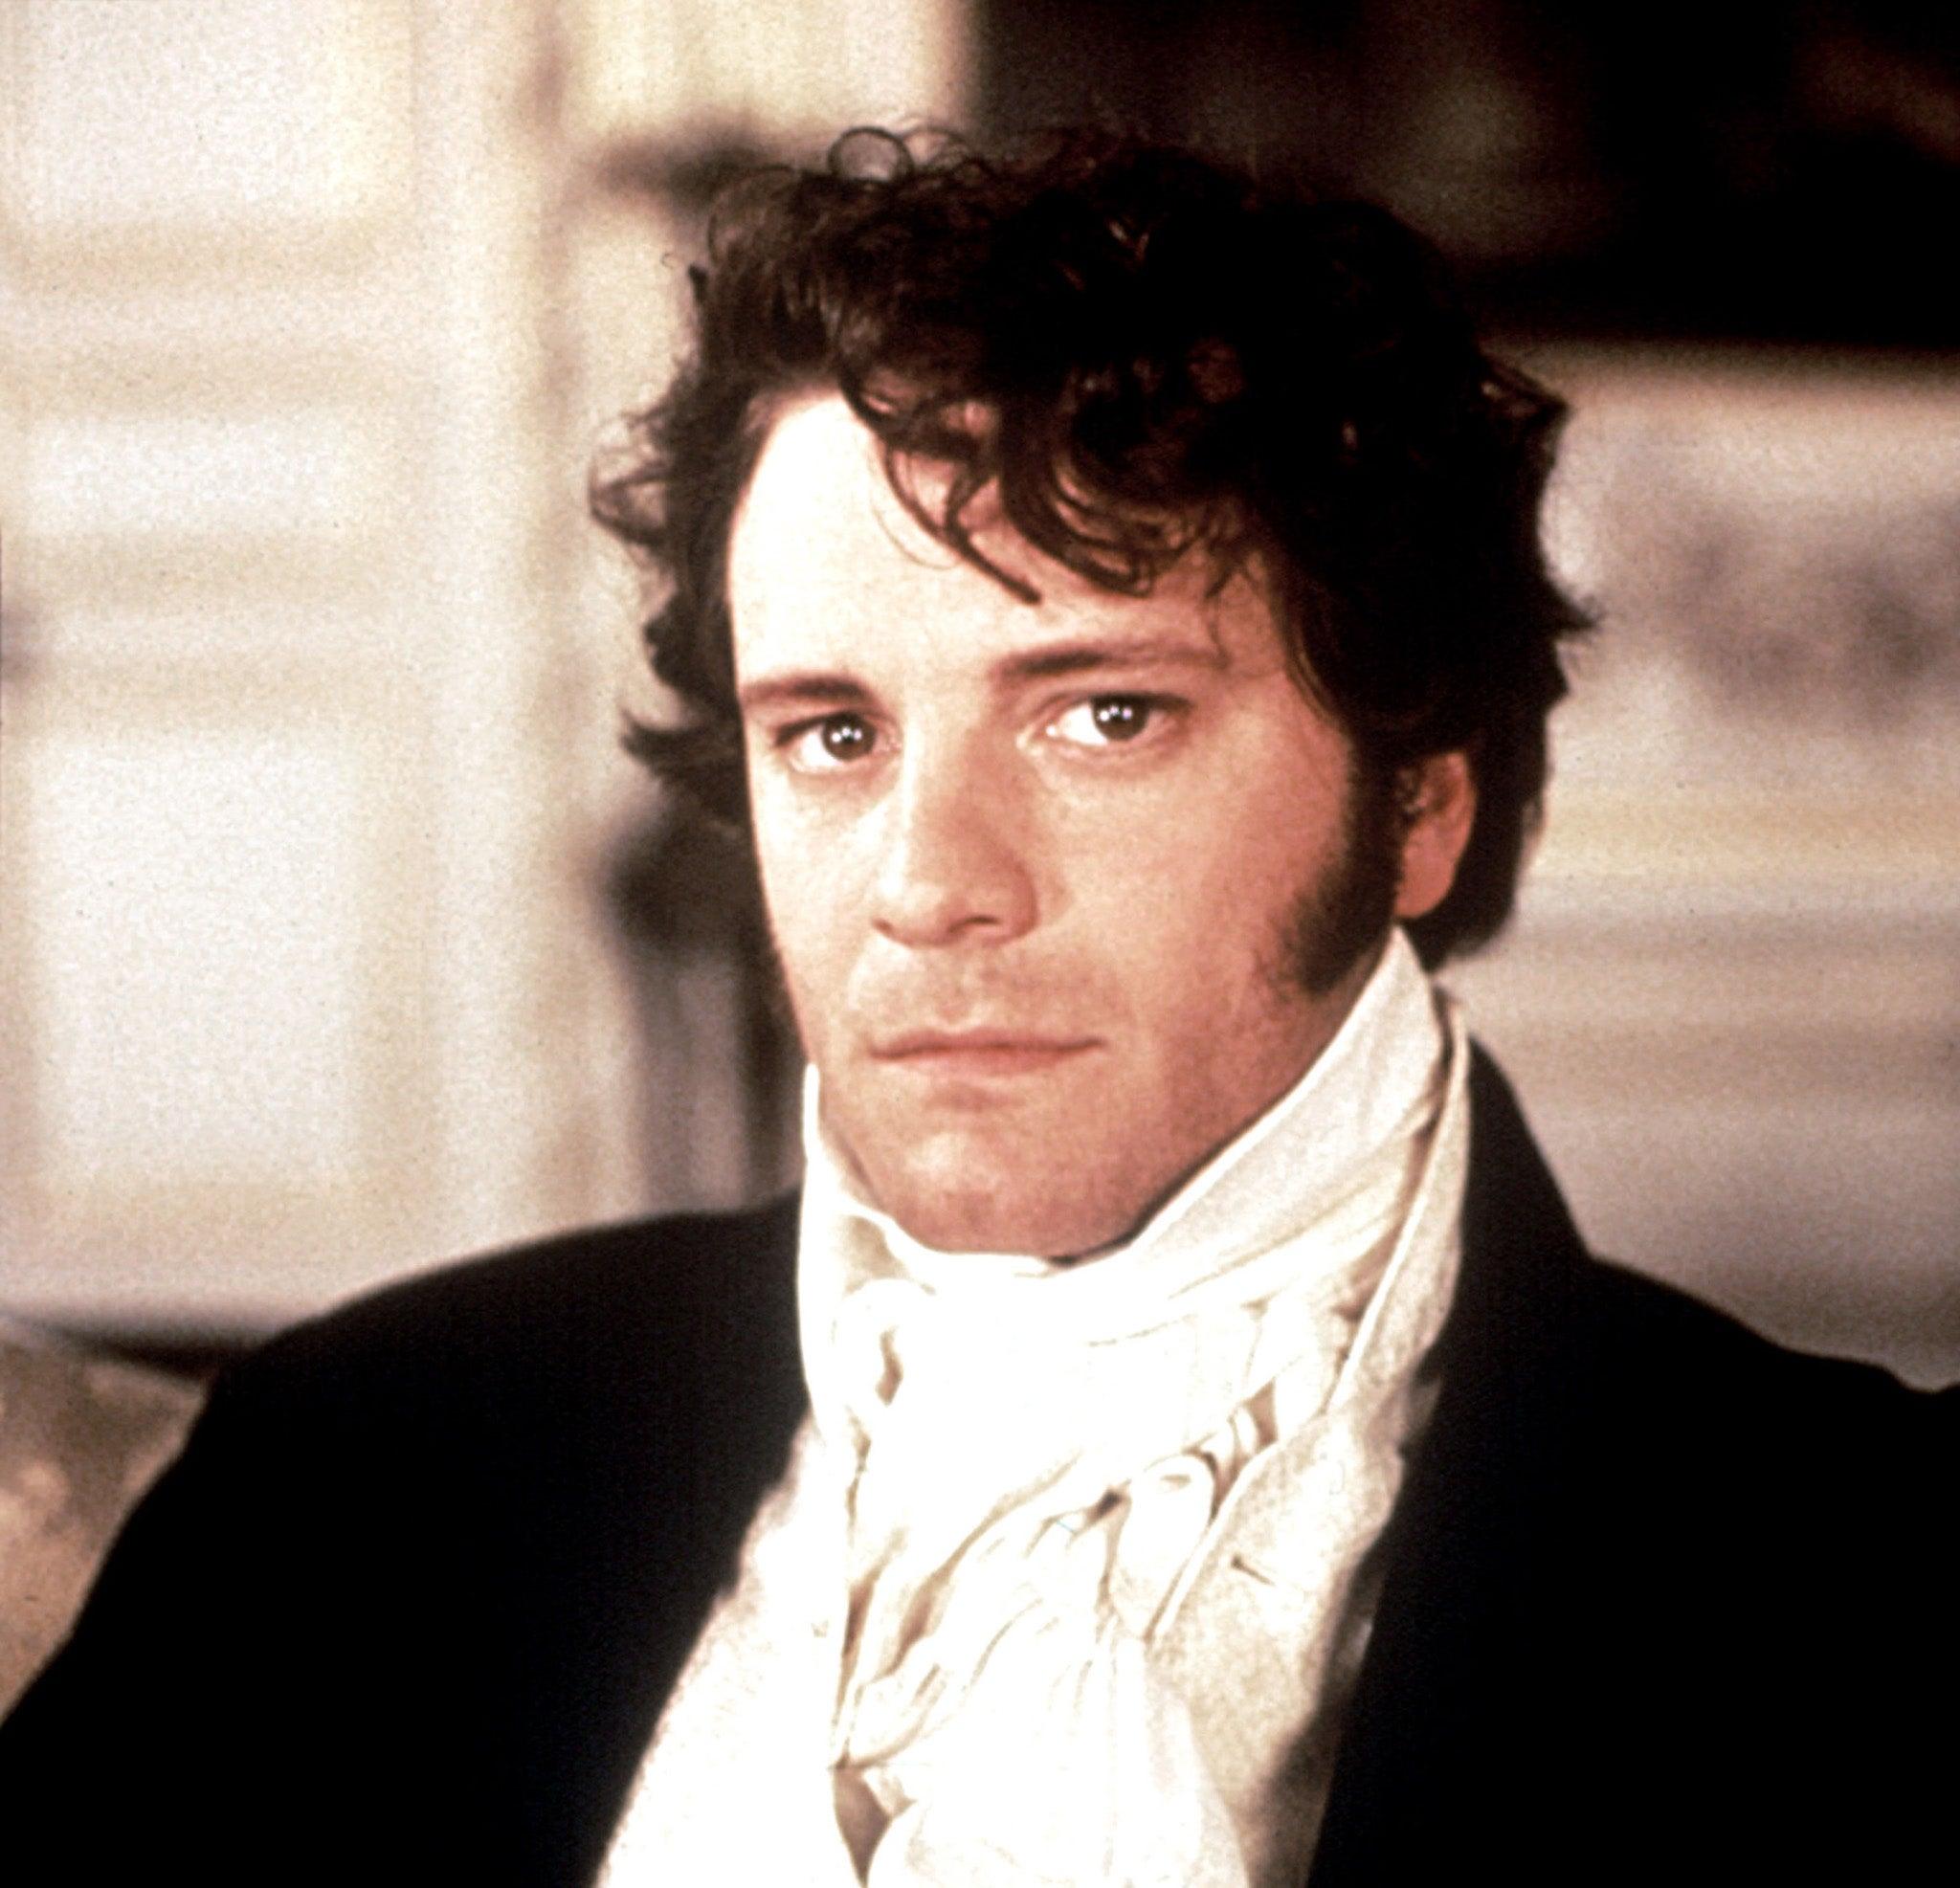 The secret 'snog' in Jane Austen revealed | The Independent